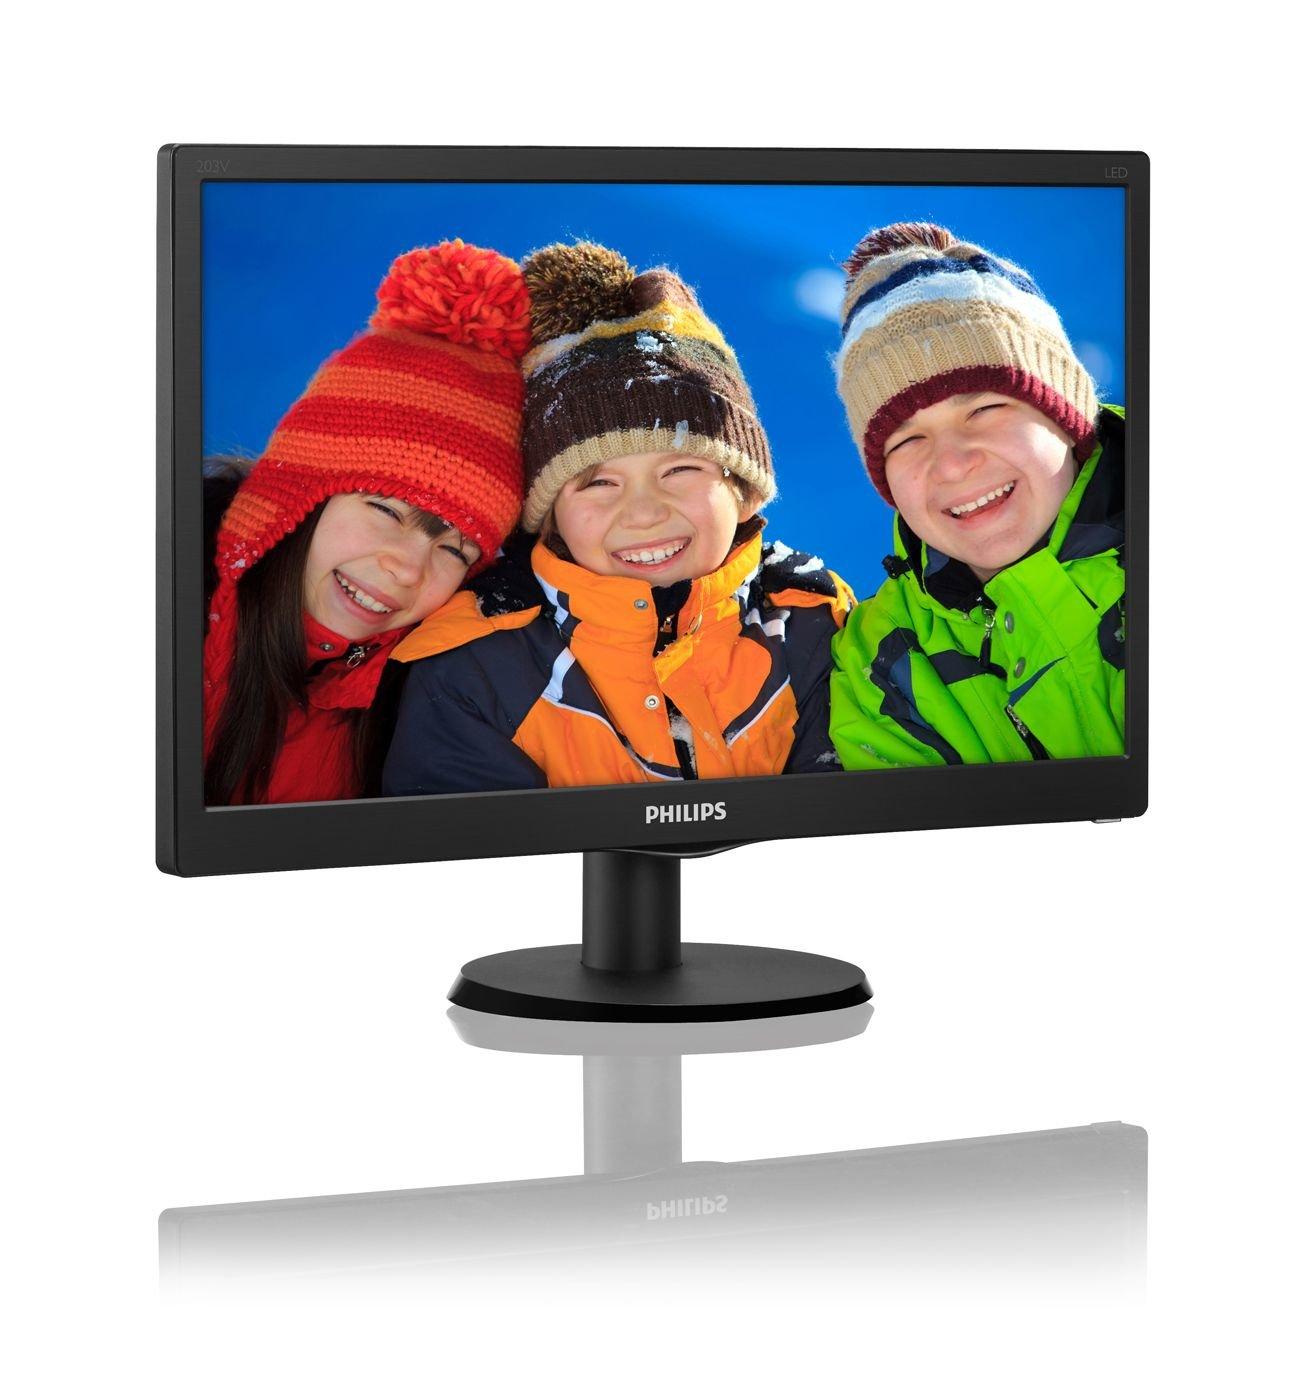 "Philips 276E8FJAB 27"" Class IPS Slim LED Monitor, 2560 x 1440, 350cd/m2, 4ms, Speakers, VGA, DisplayPort, HDMI 1"